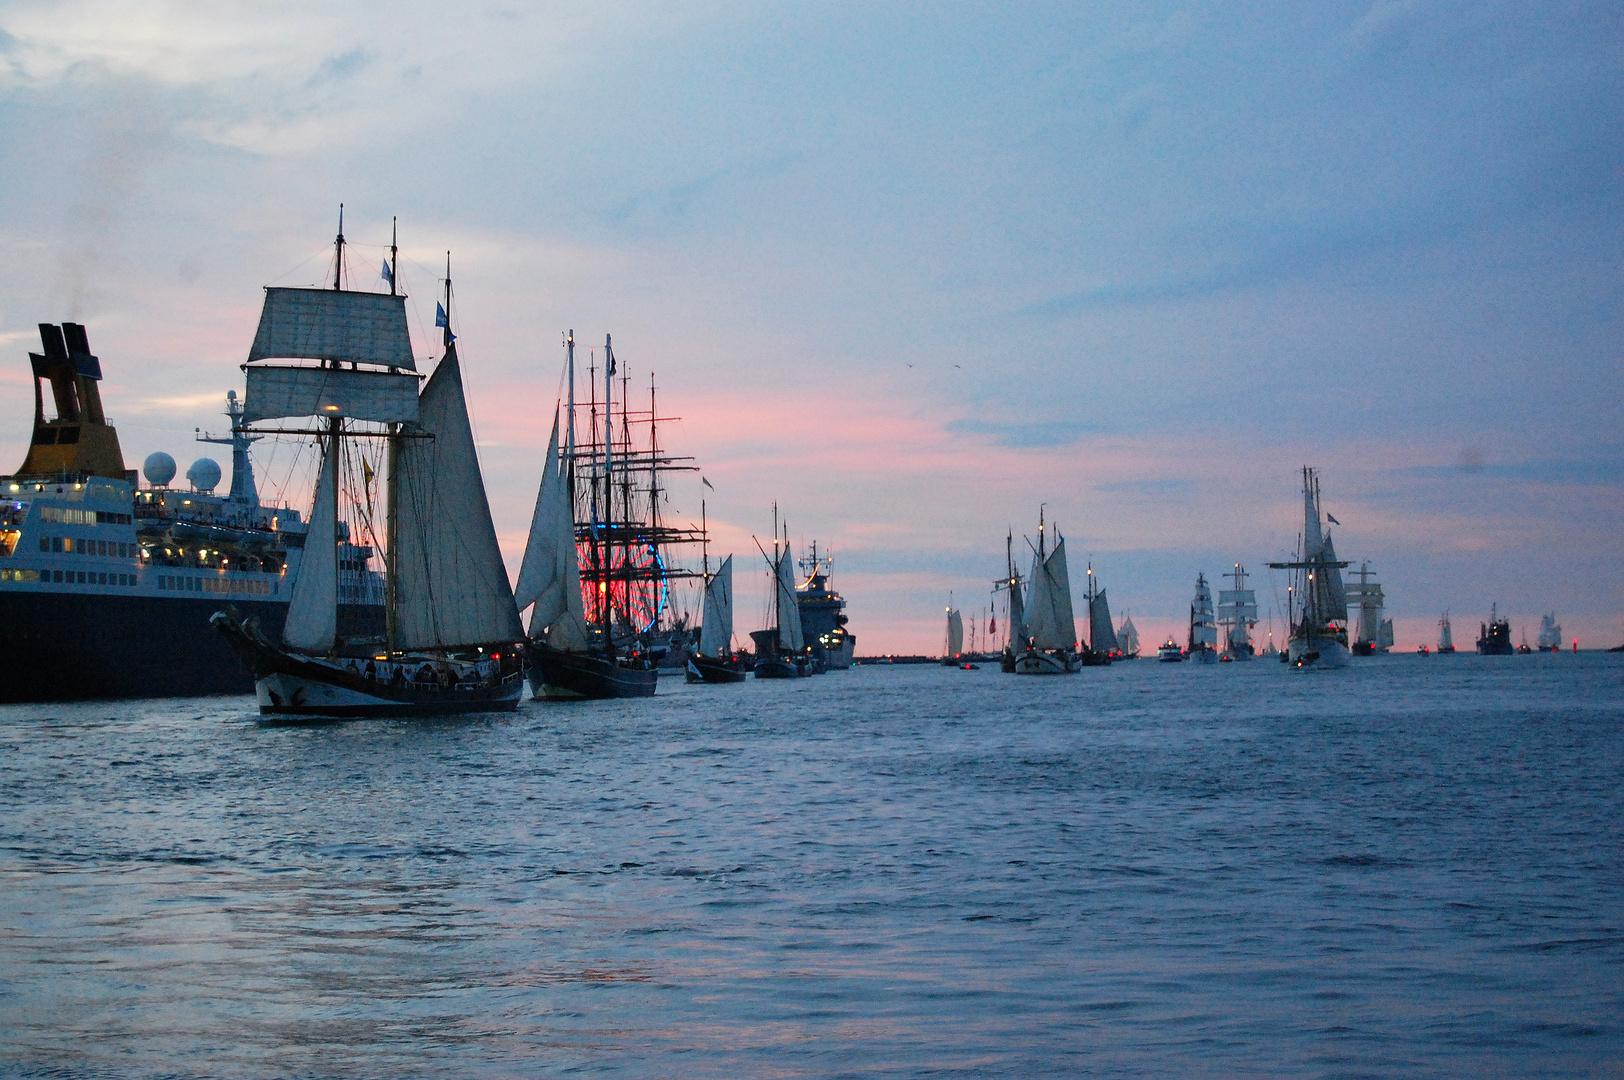 20. Rostocker Hanse Sail 5